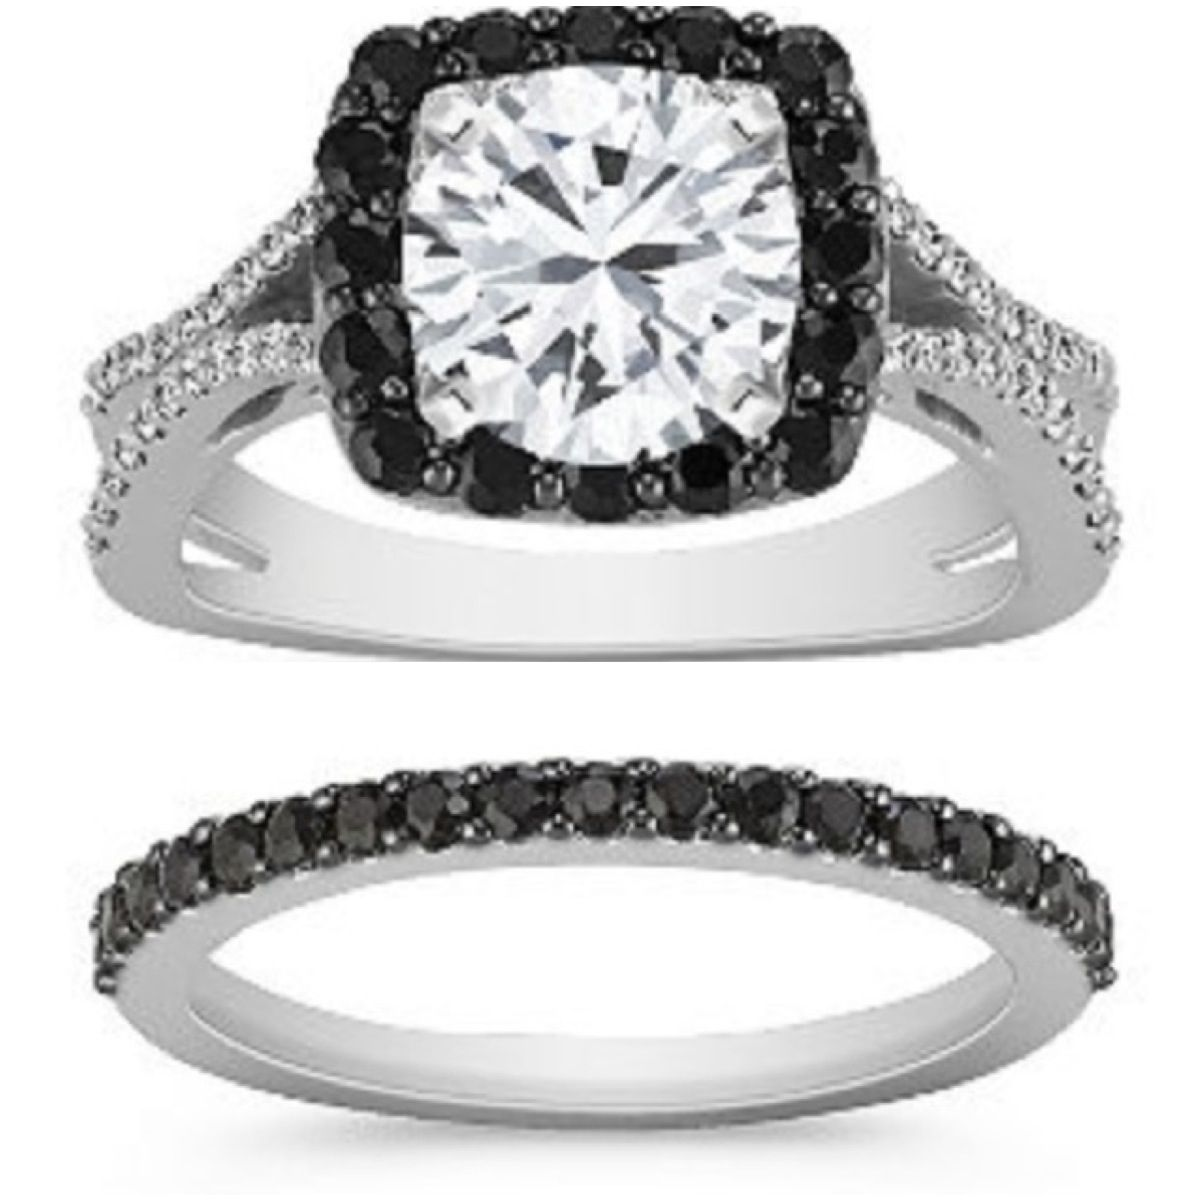 Black sapphire setting and wedding band black sapphire